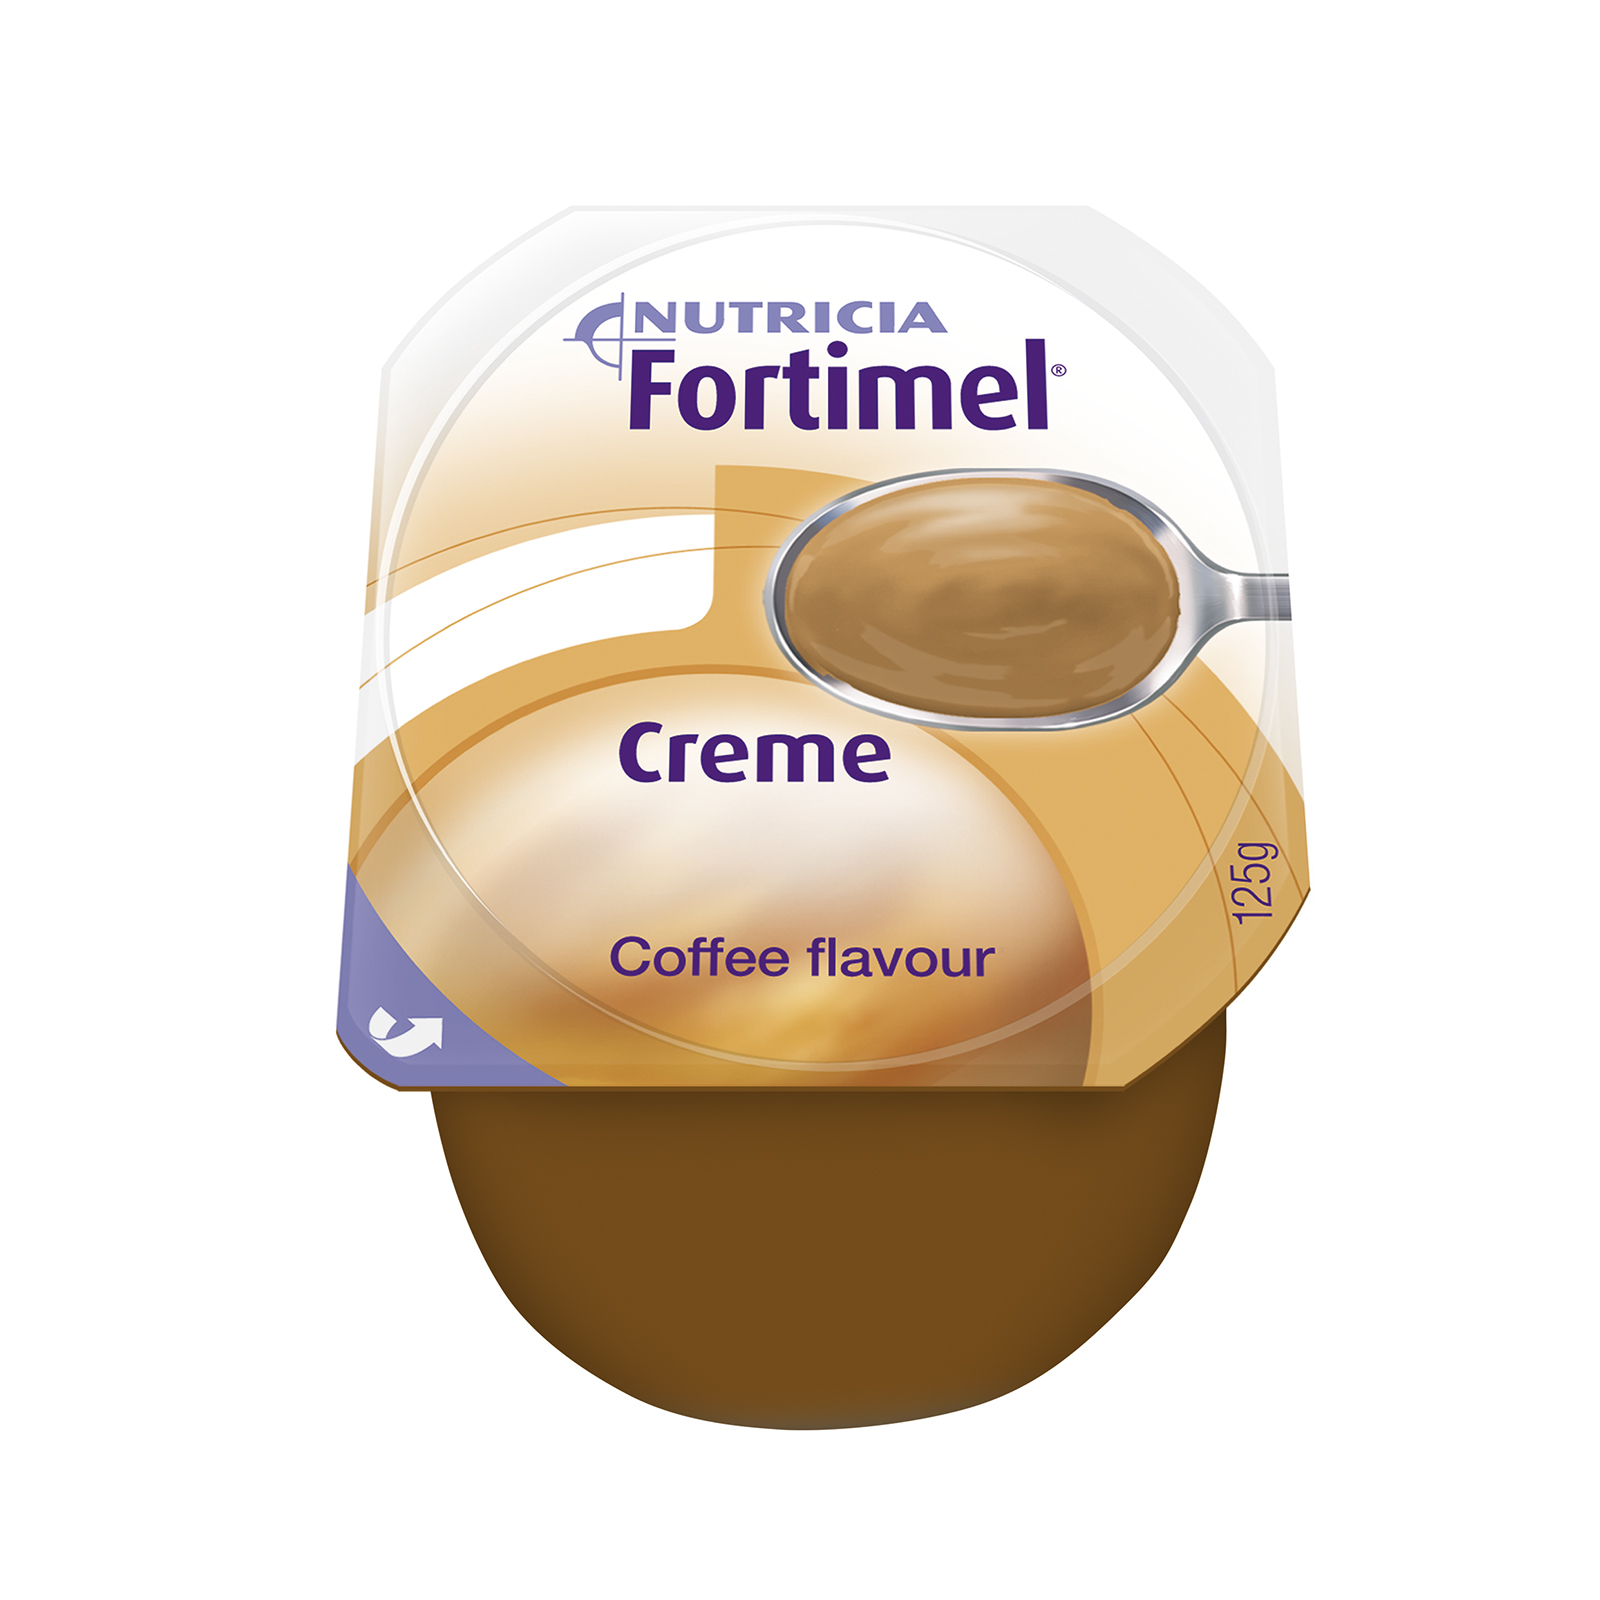 Fortimel Creme caffè 4x Vasetto 125 g | Nutricia